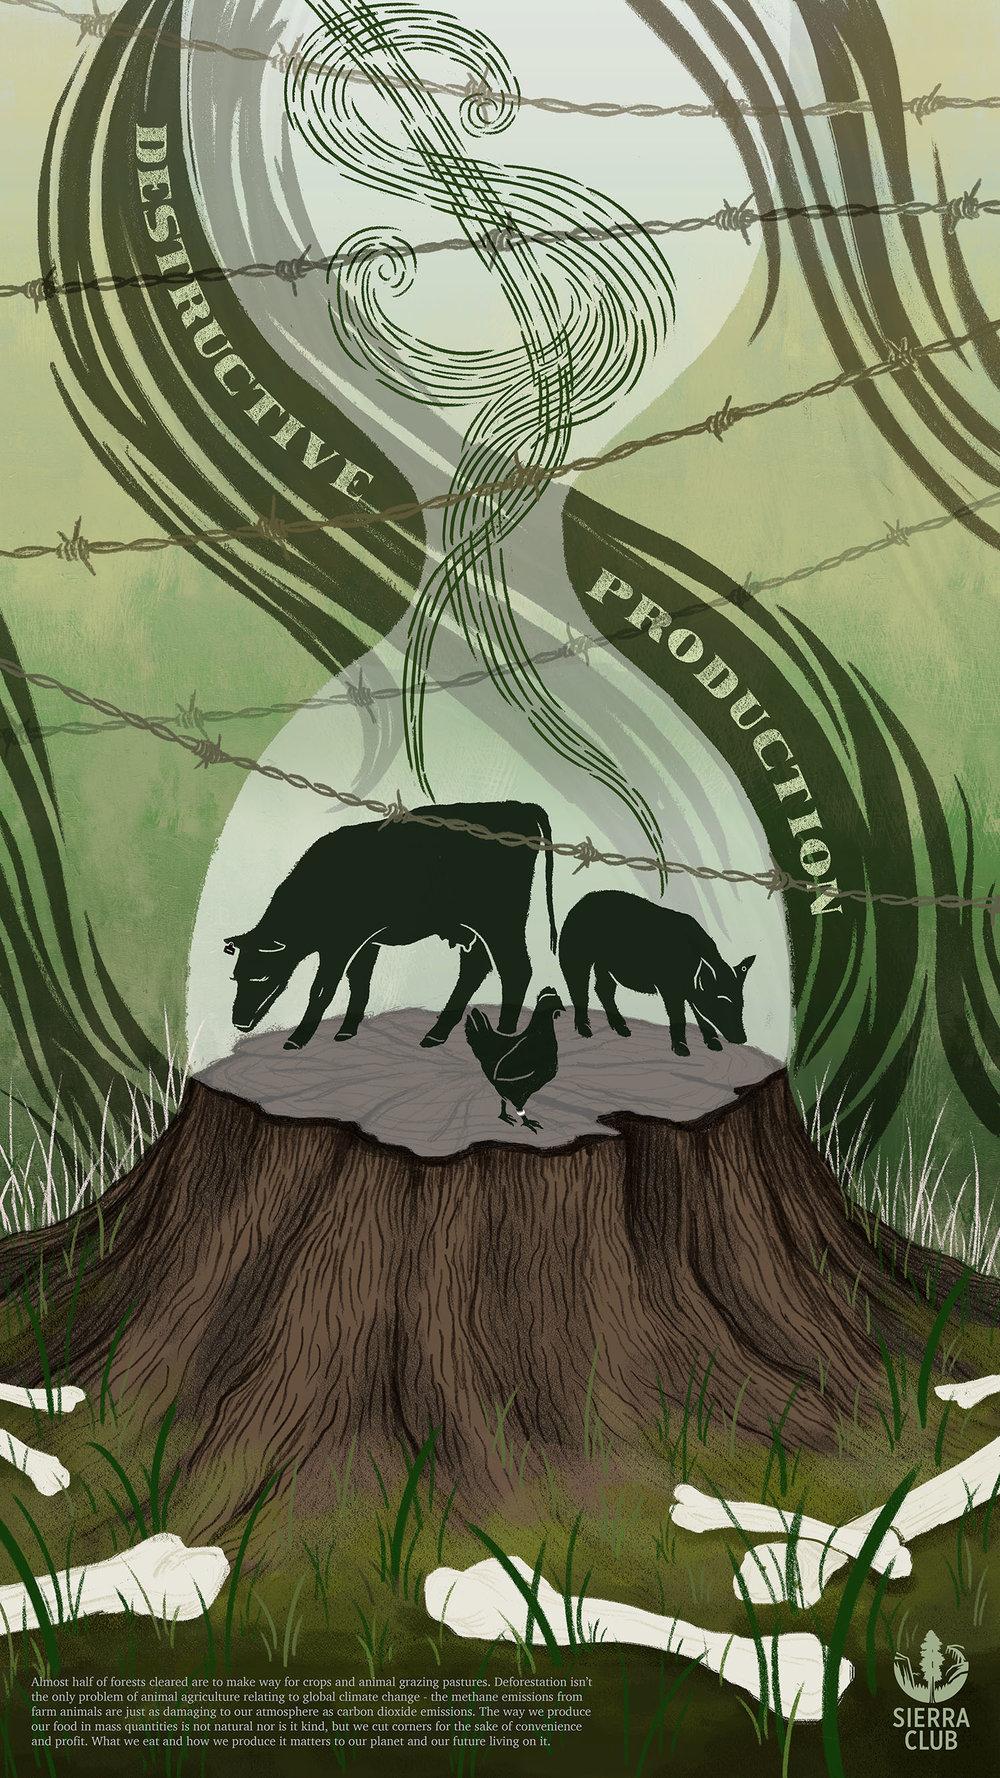 The Human Effect: Environmental Awareness Poster Series (1)